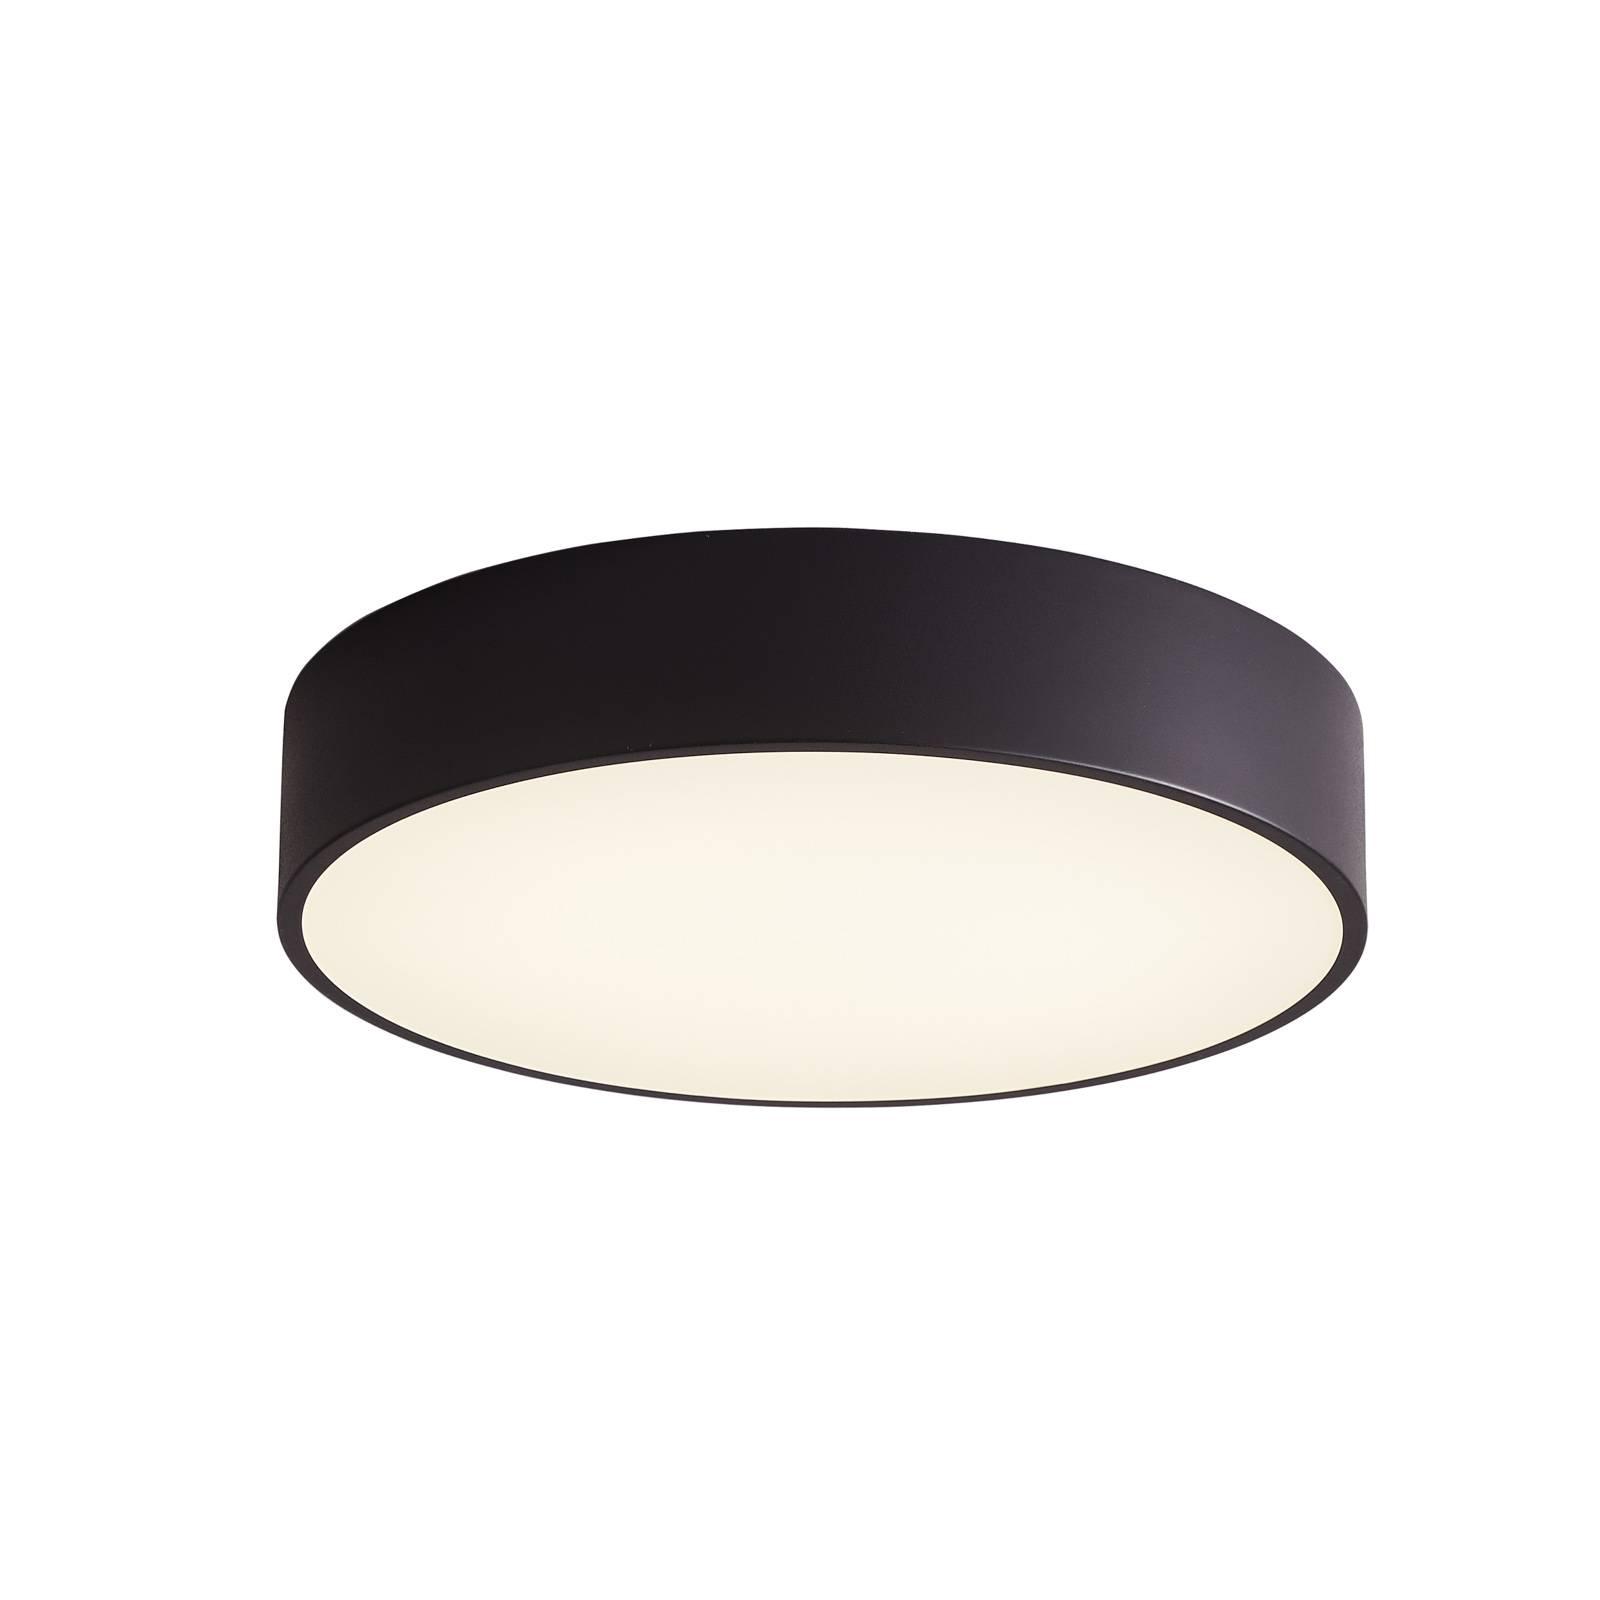 Arcchio Noabelle -LED-kattovalaisin, musta, 60 cm